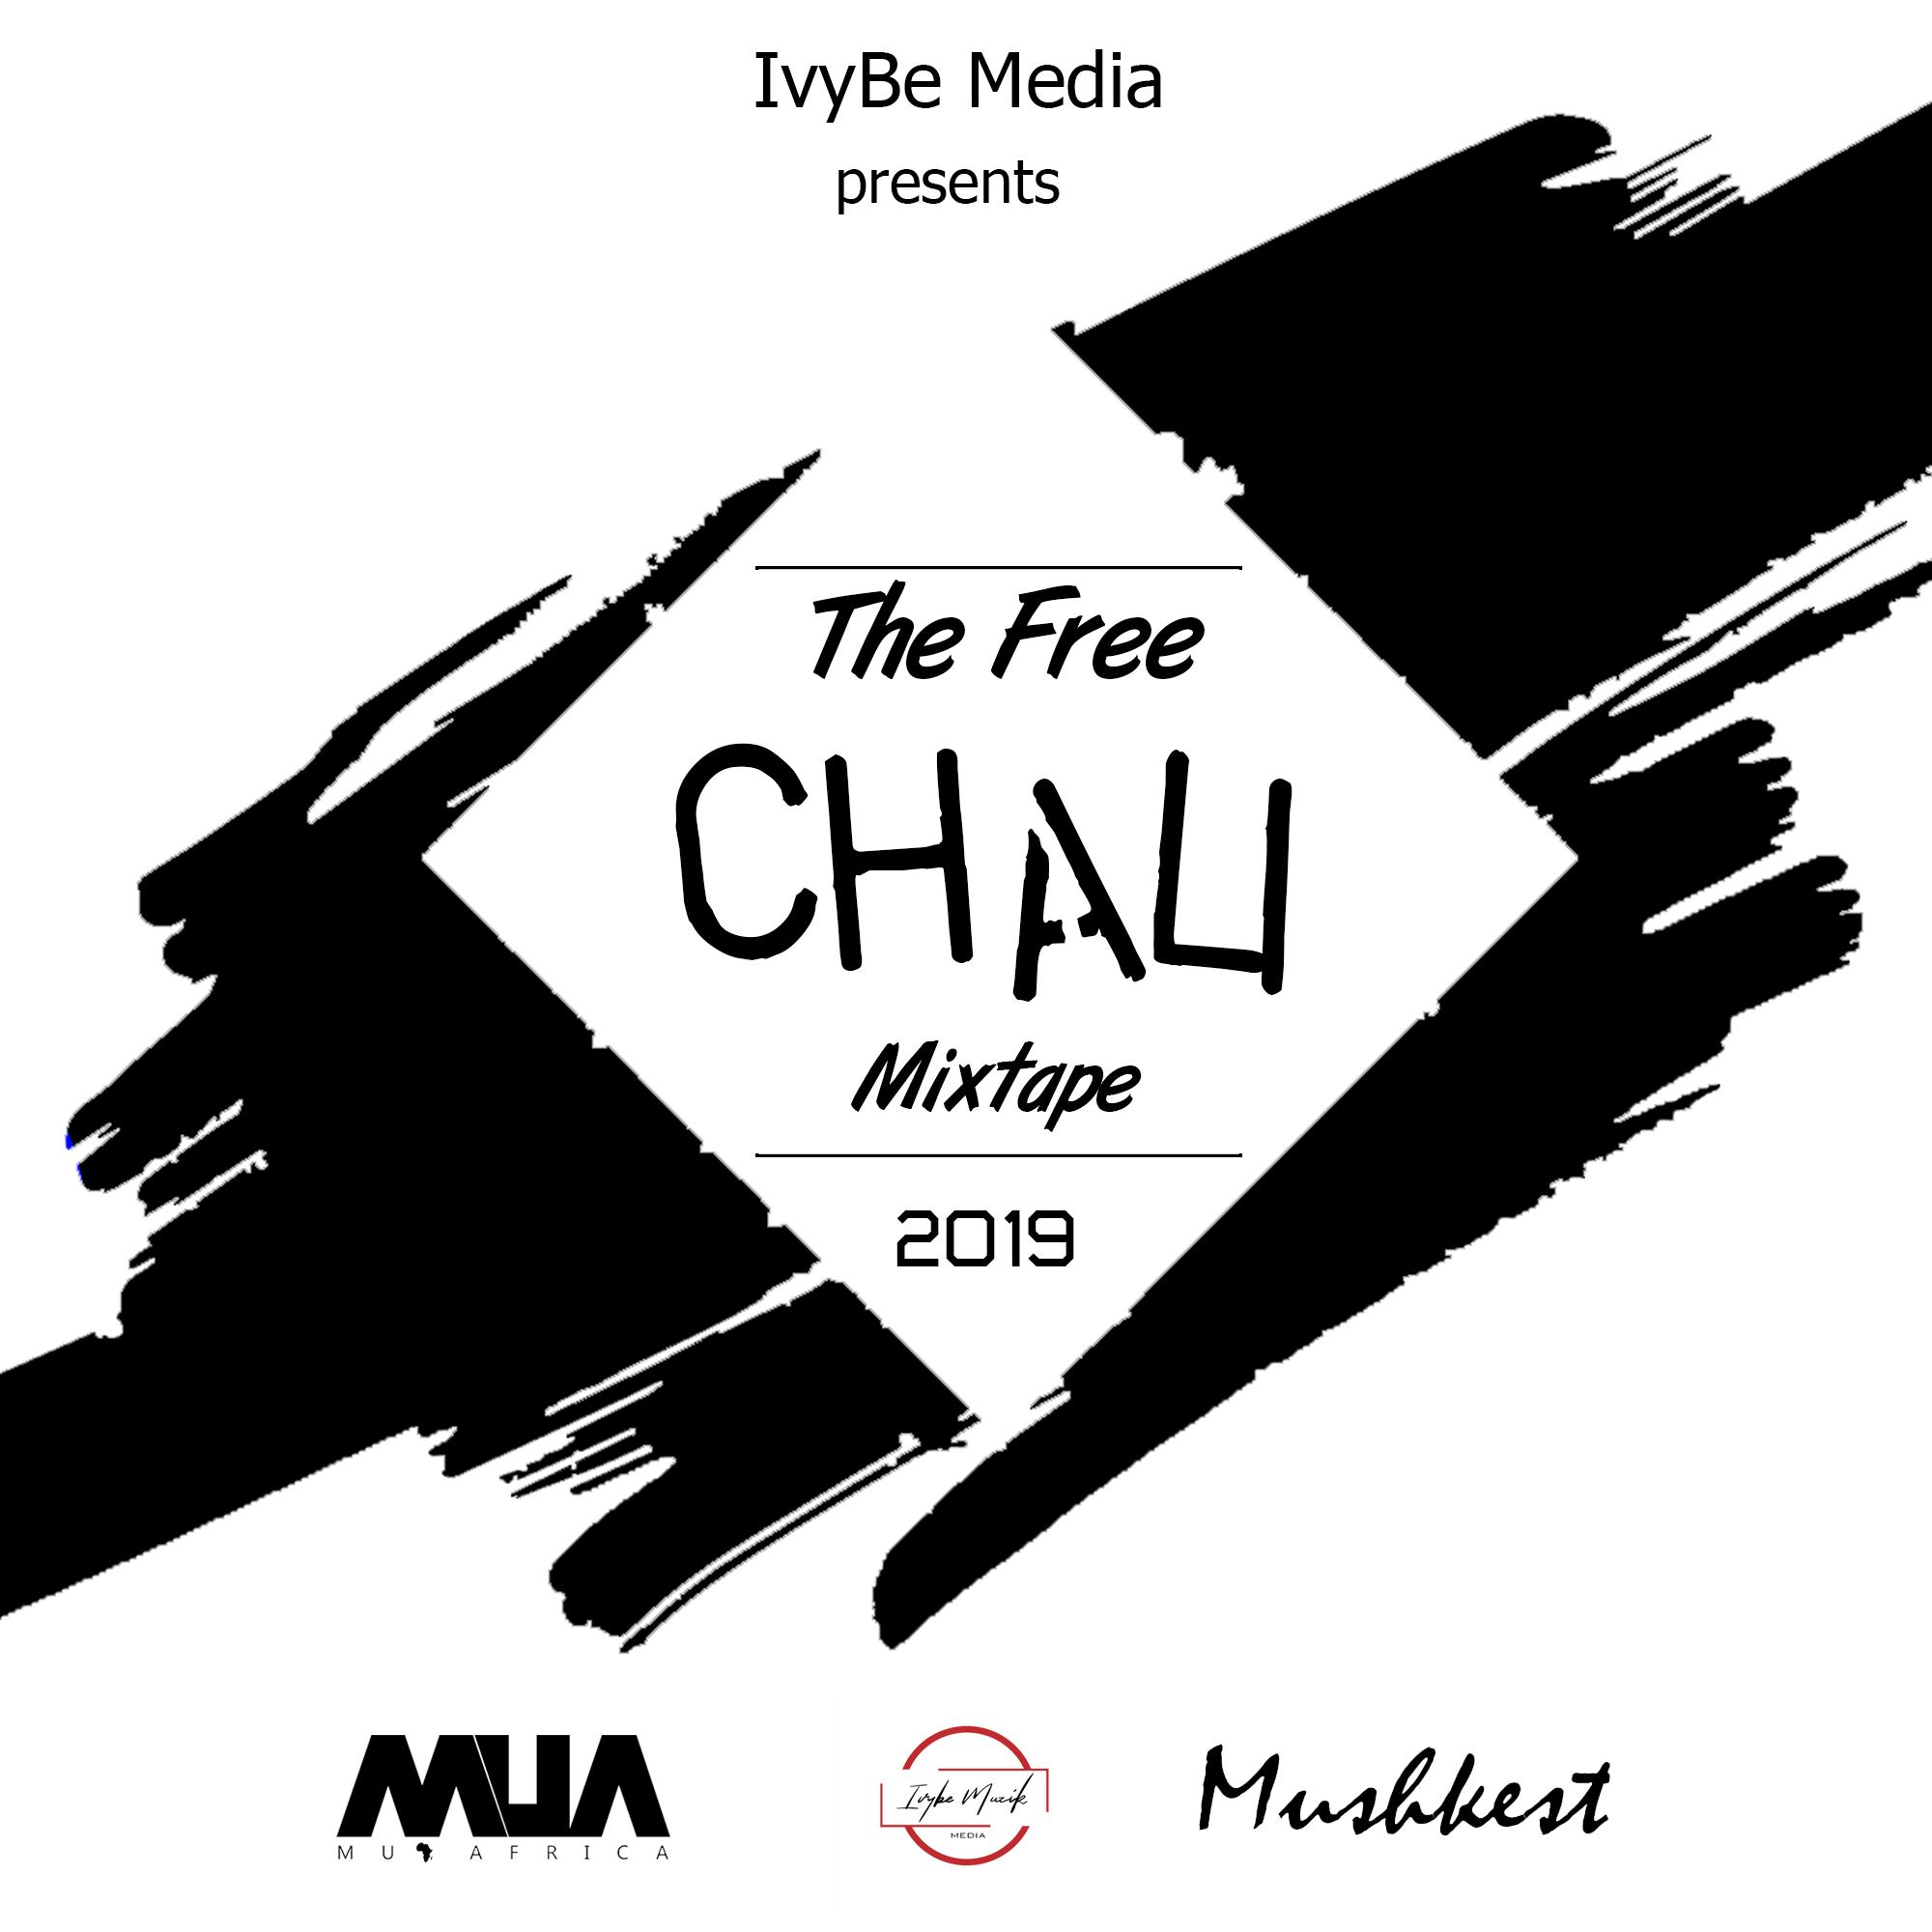 The Free Chali Mix tape